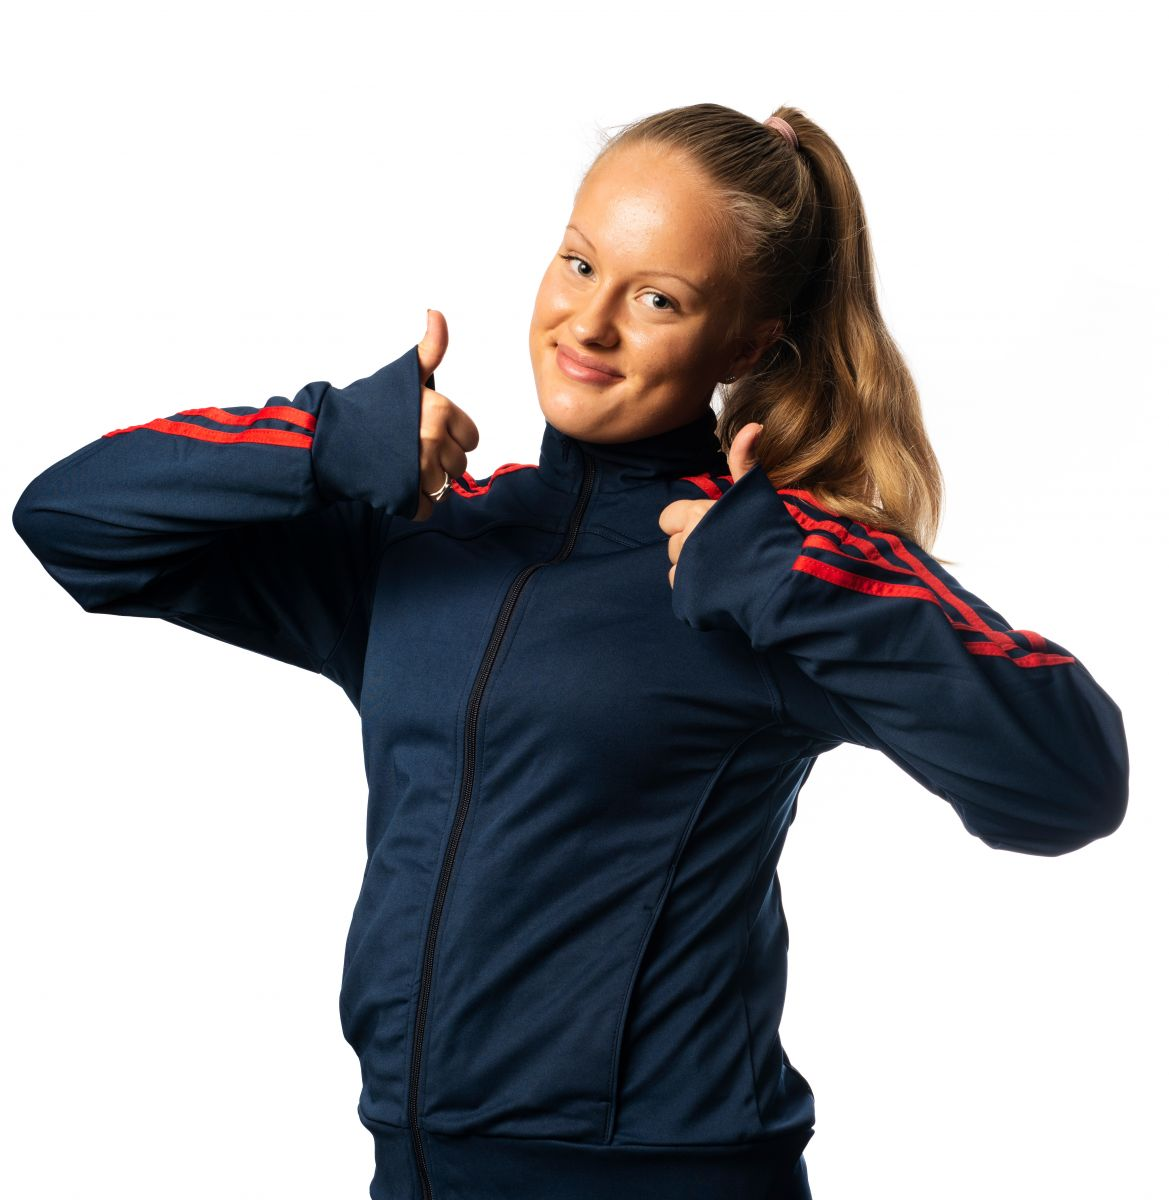 Yrla Karlsson